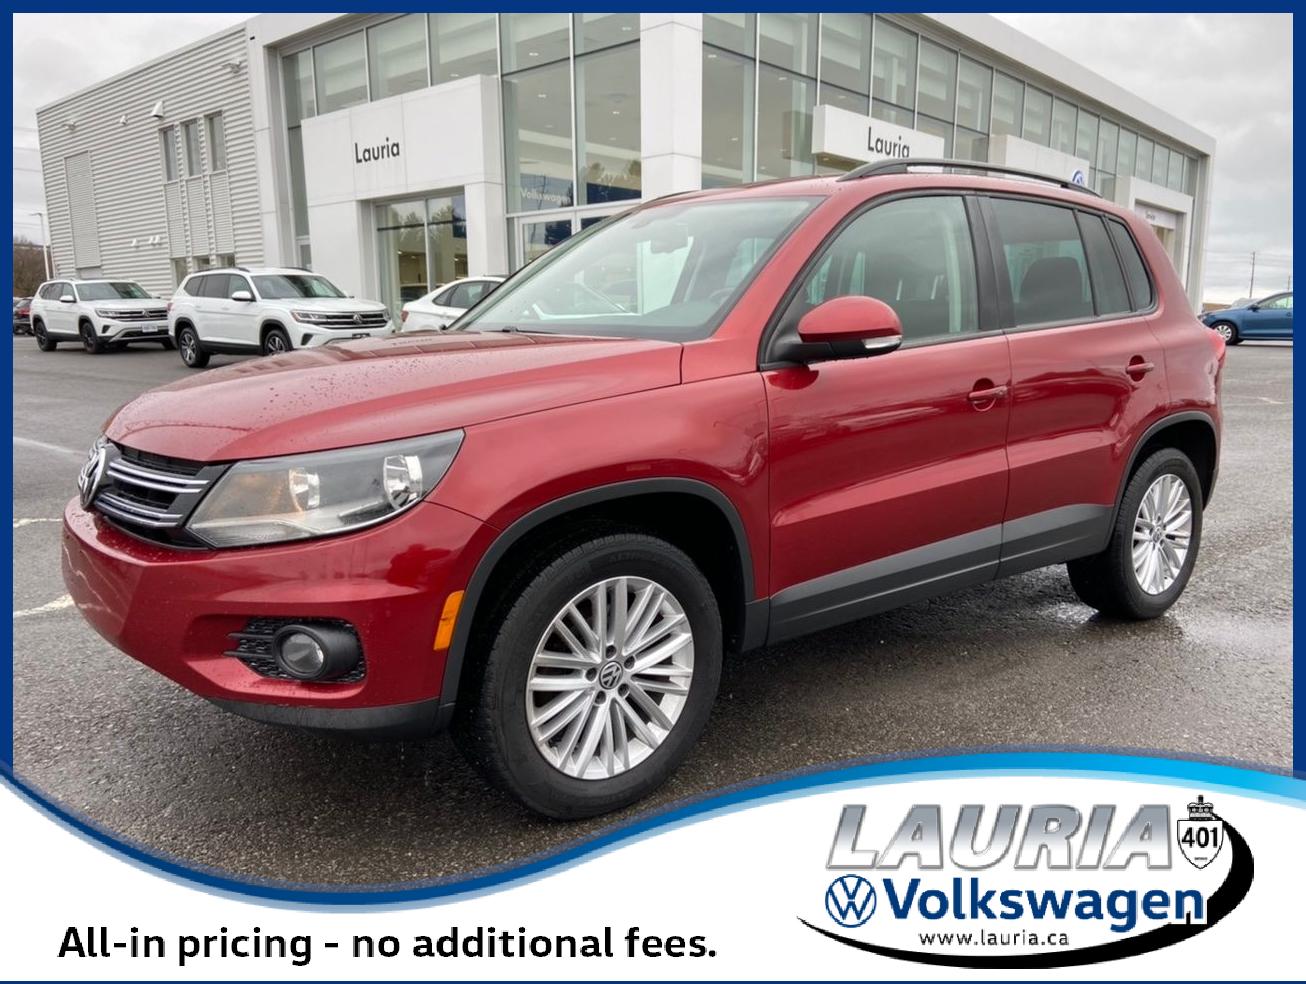 used 2016 Volkswagen Tiguan car, priced at $18,888